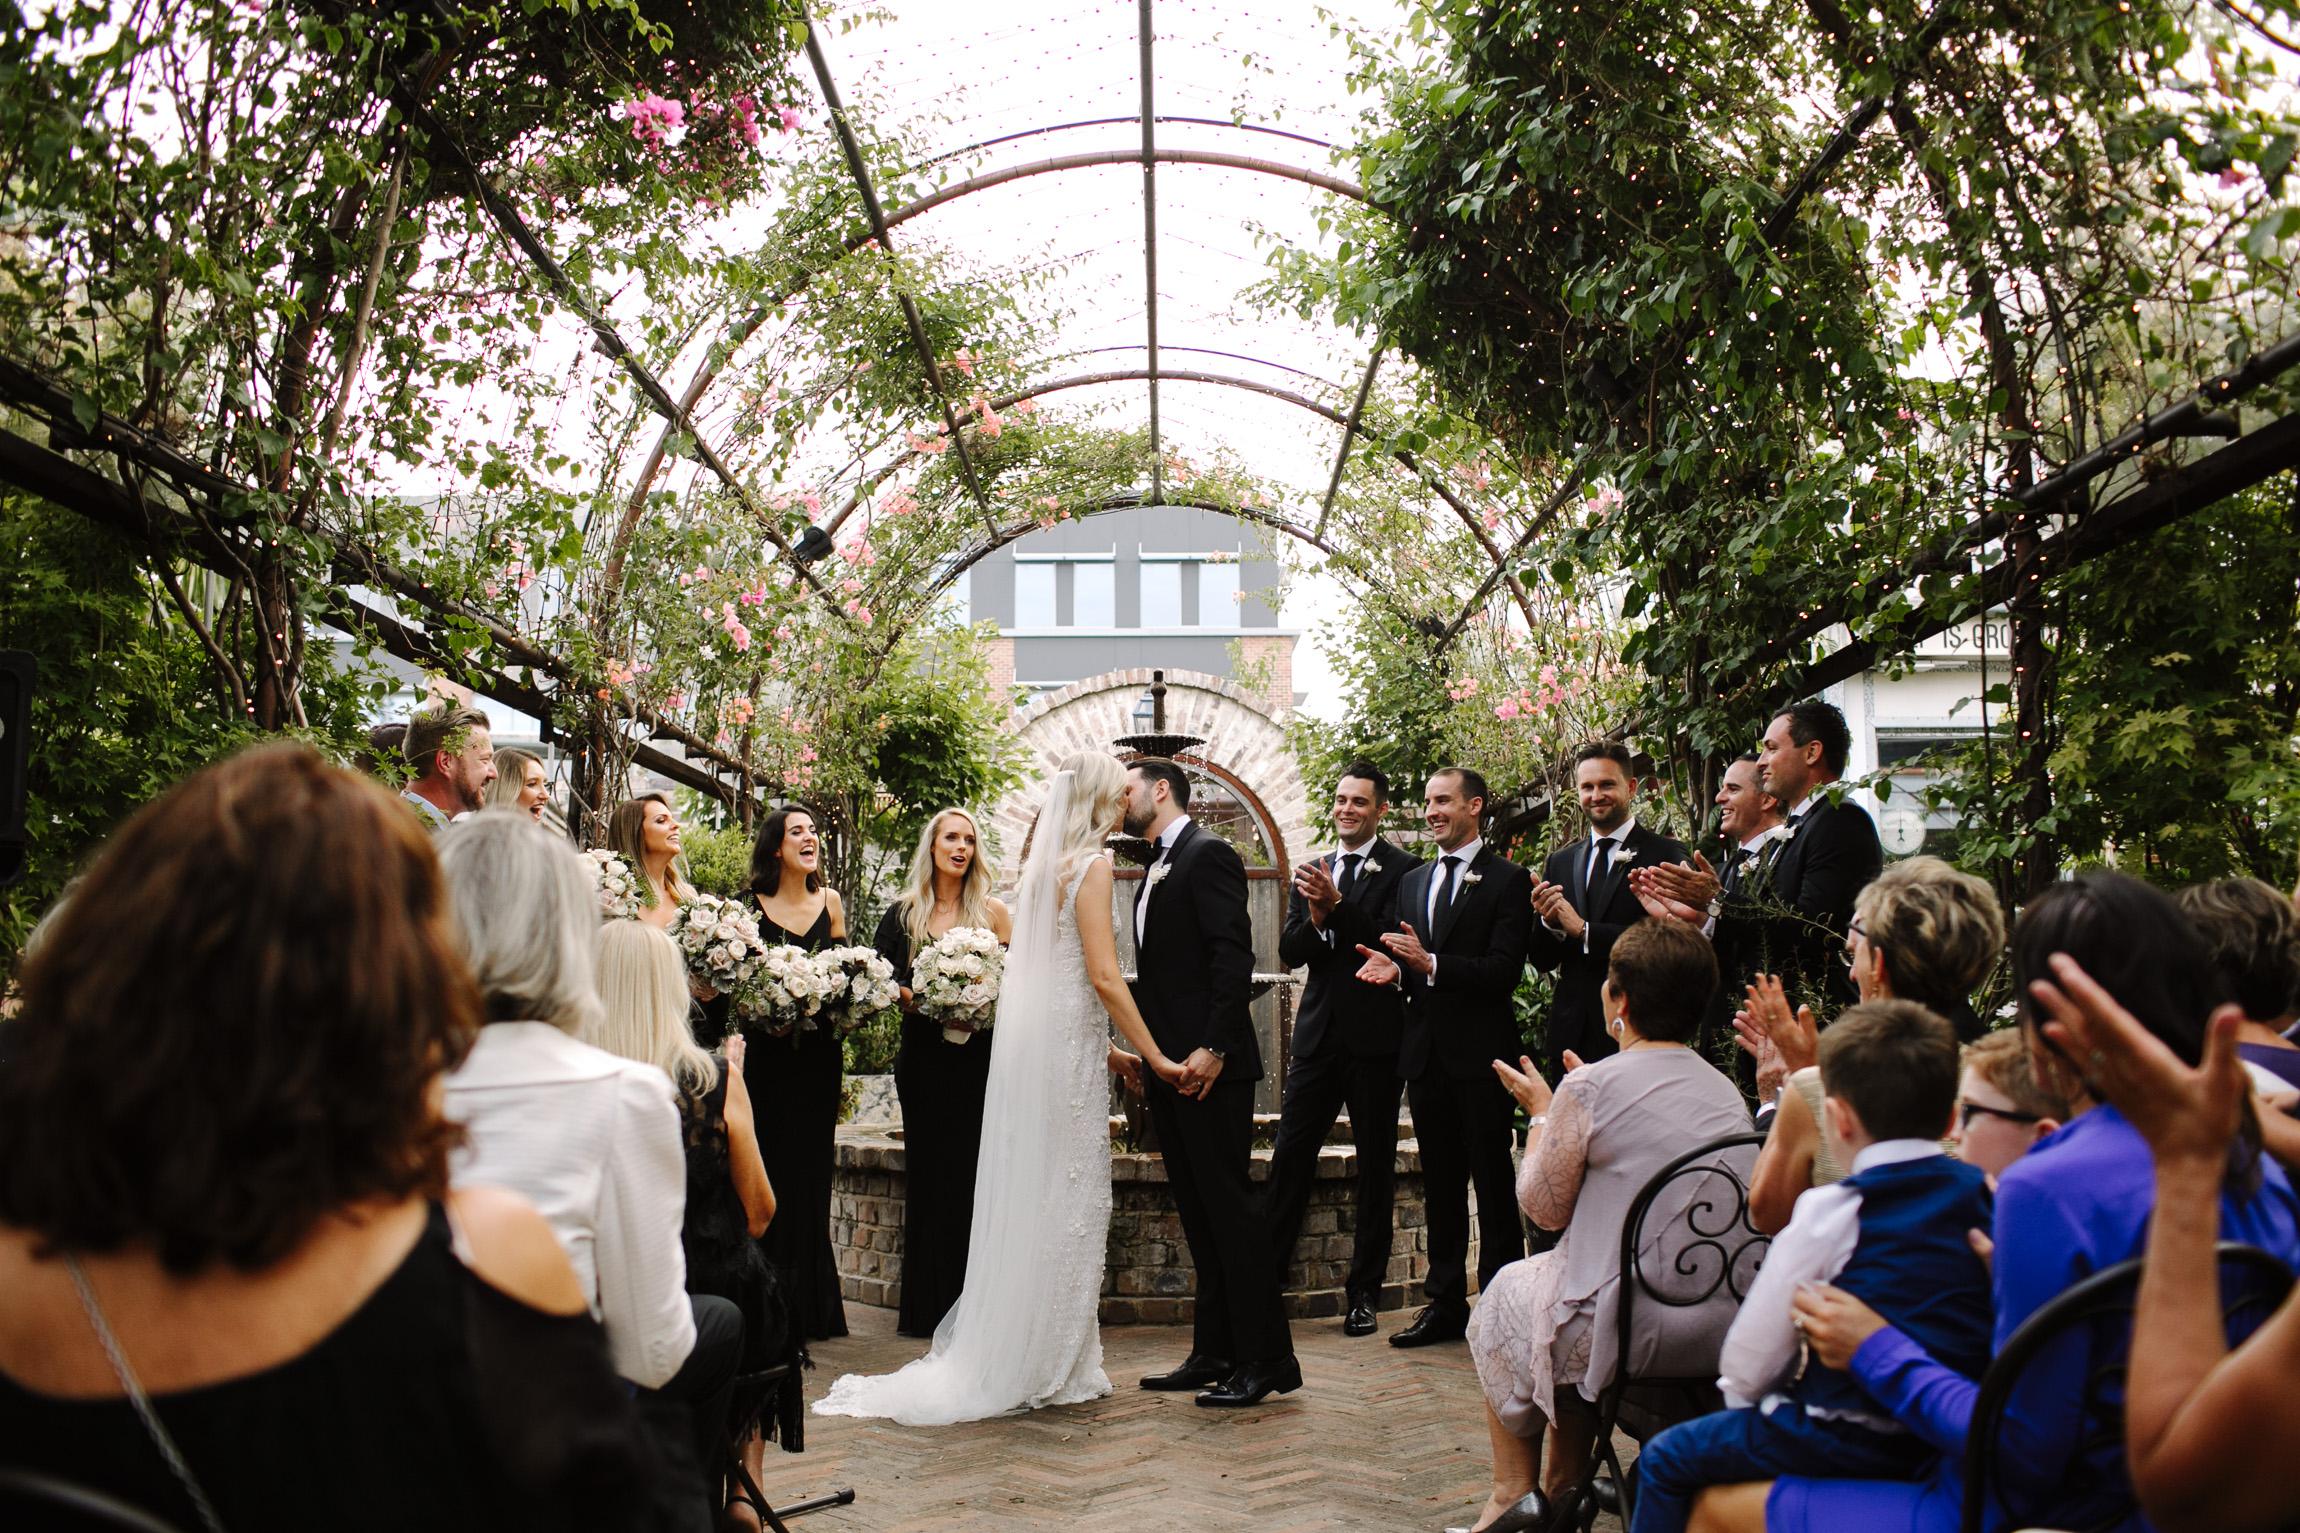 180223_justinaaron_wedding_charlotte_david_h-128.jpg